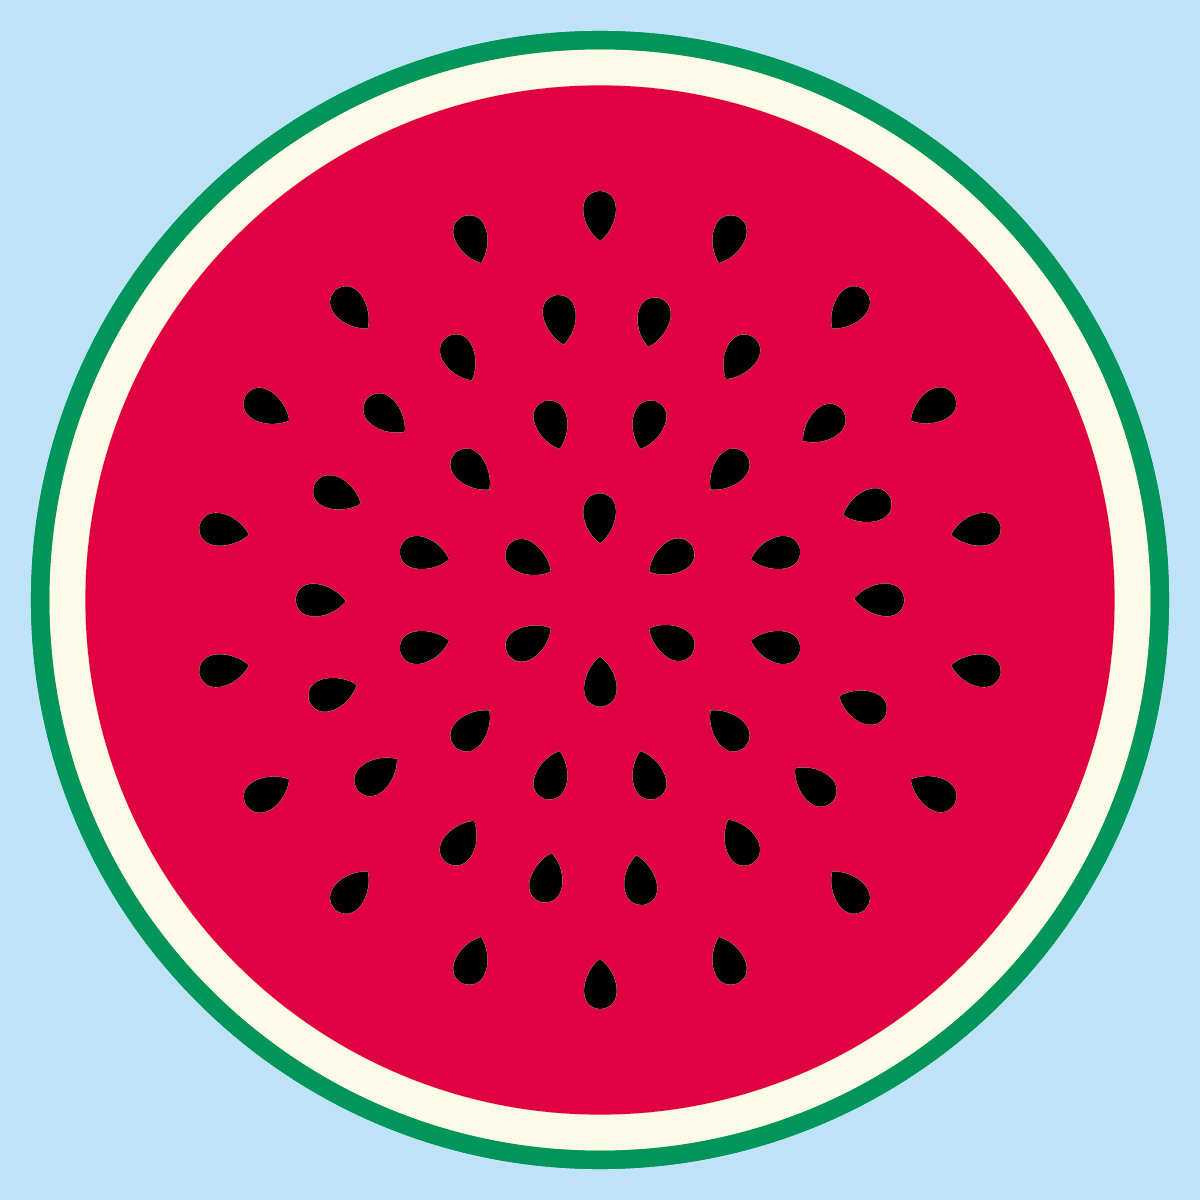 1 clipart watermelon. Clip art fruit panda